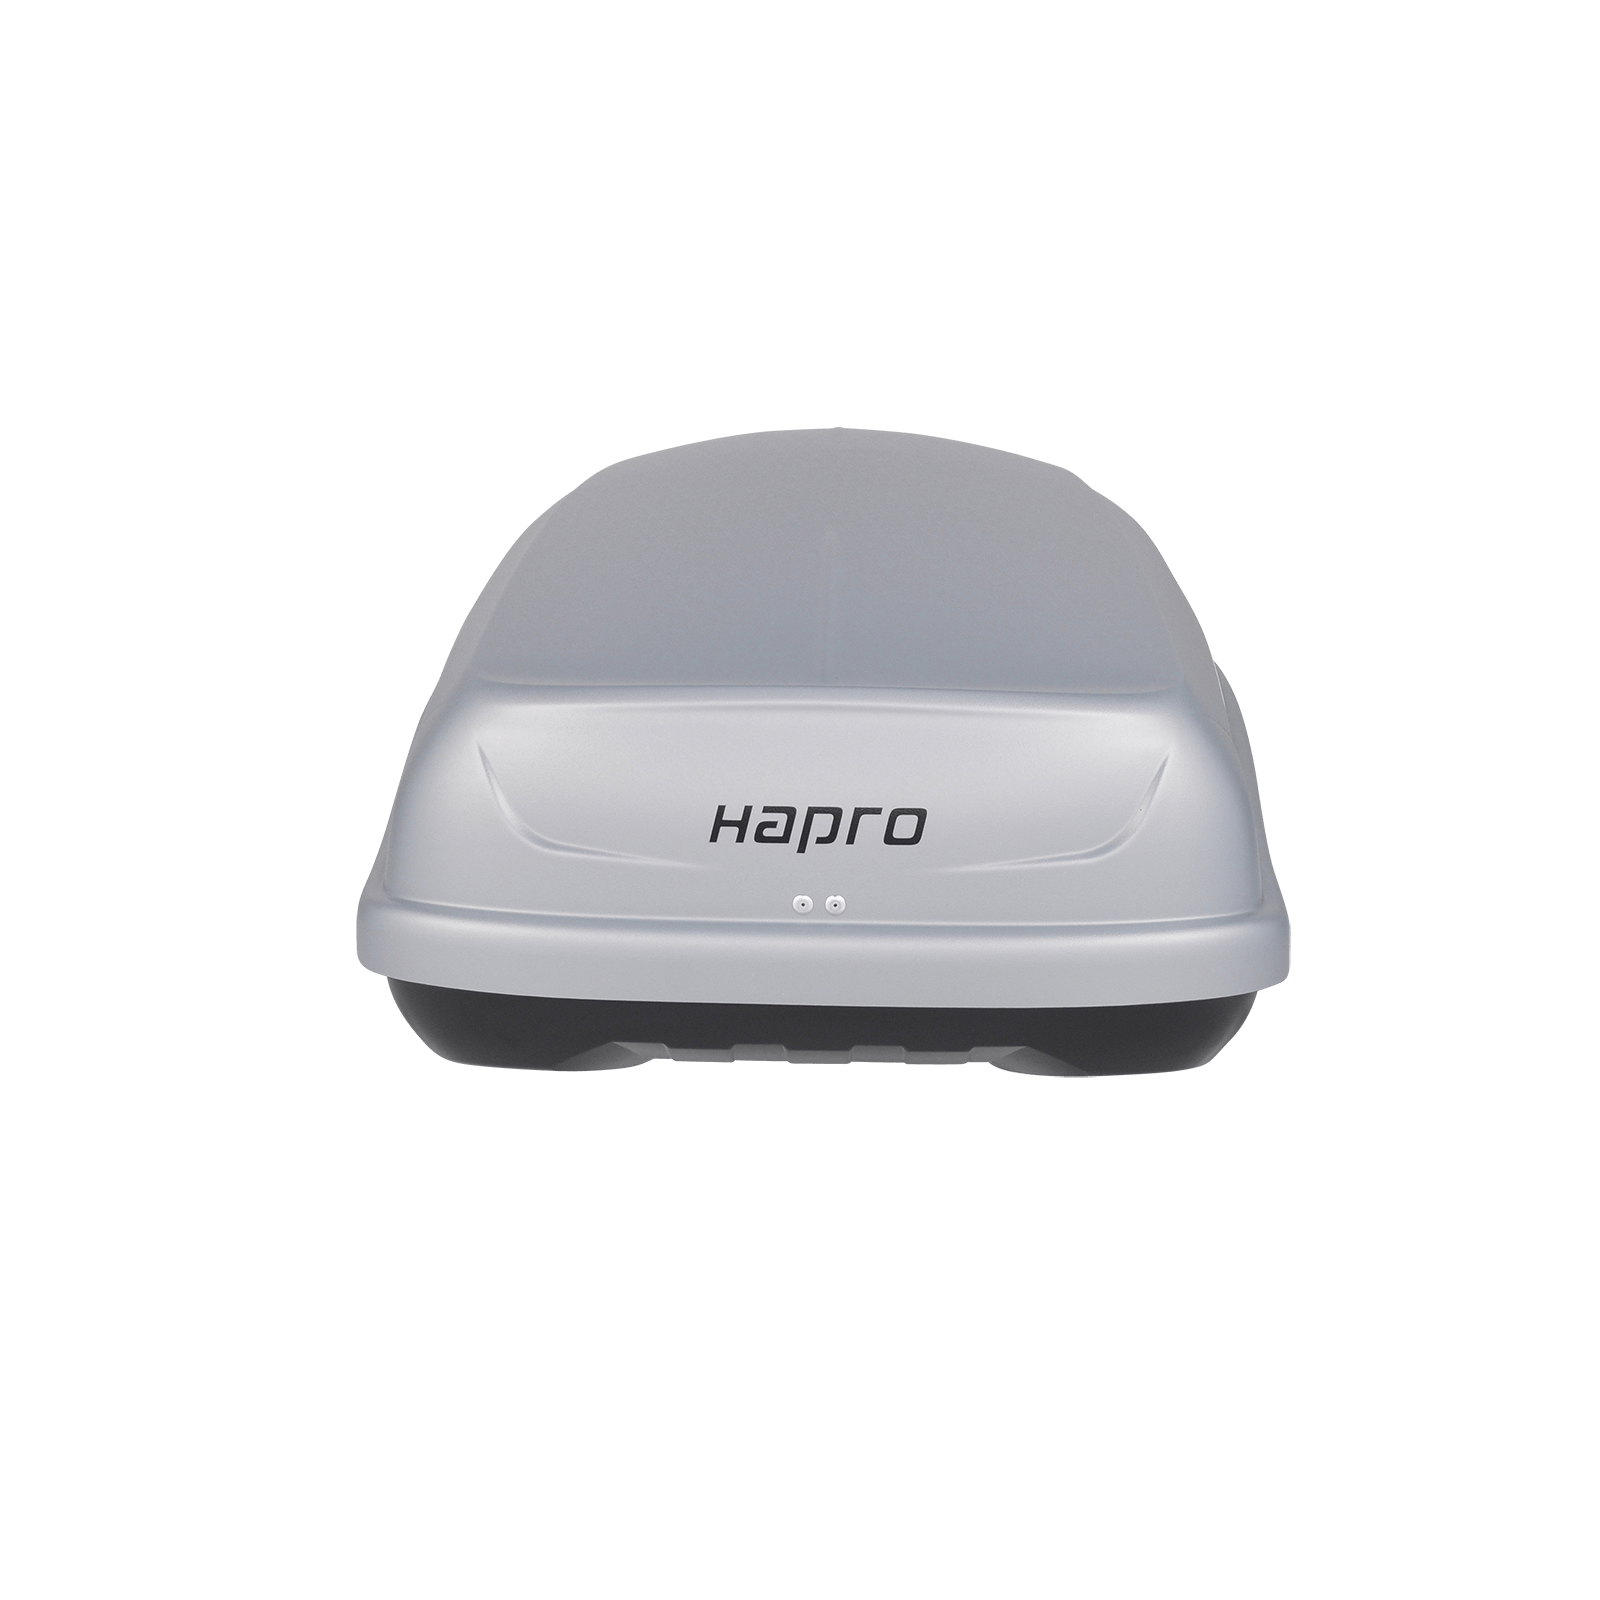 Dachbox Hapro Traxer 6.6 SilverGrey - Bild 4